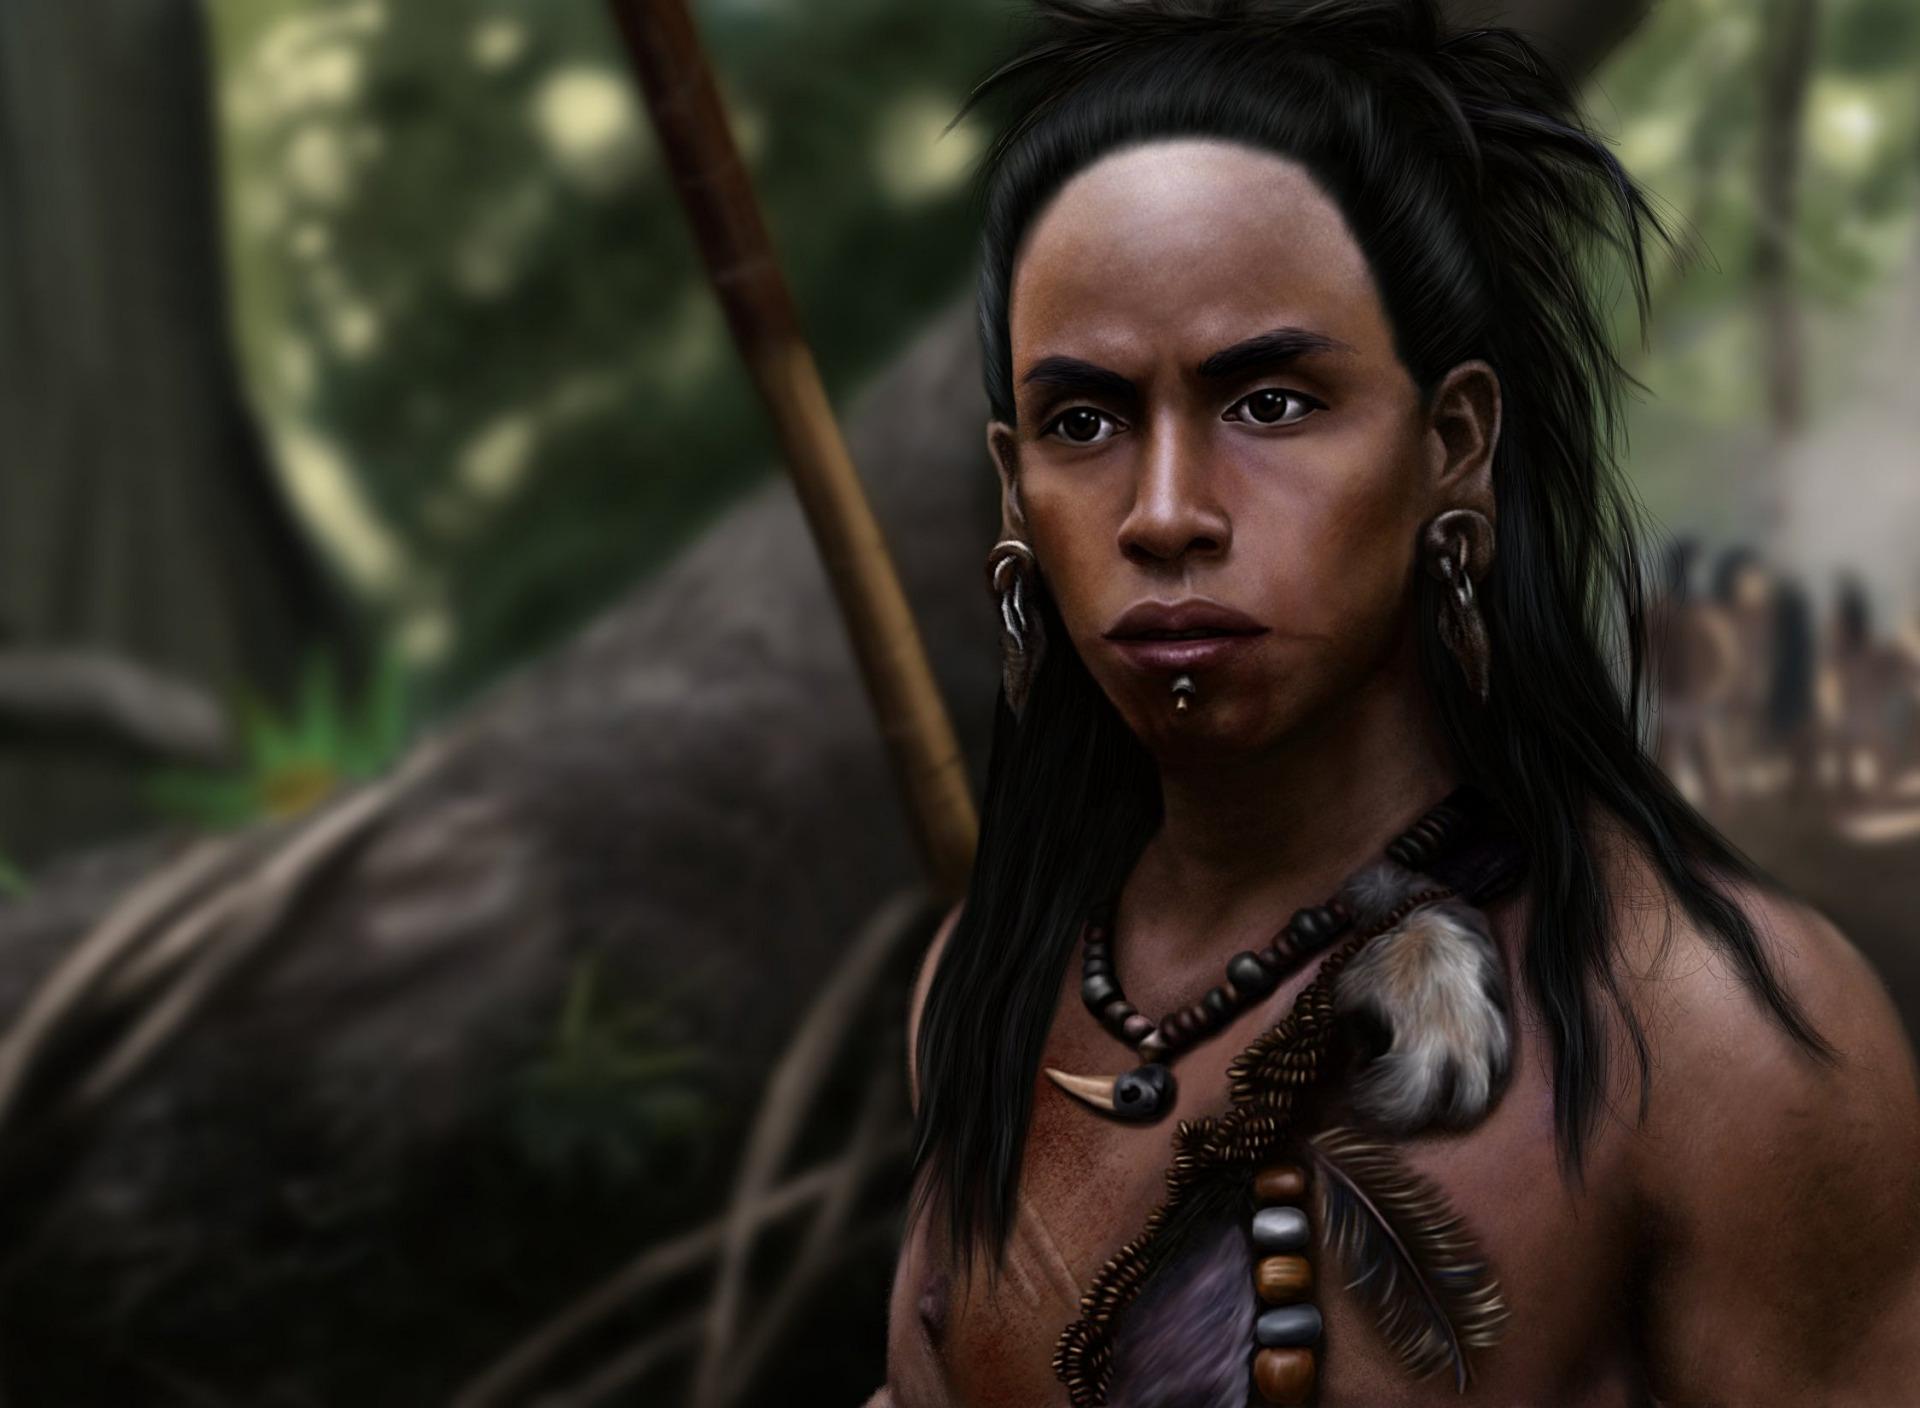 Фото героев апакалиса лапа ягуара в жизни